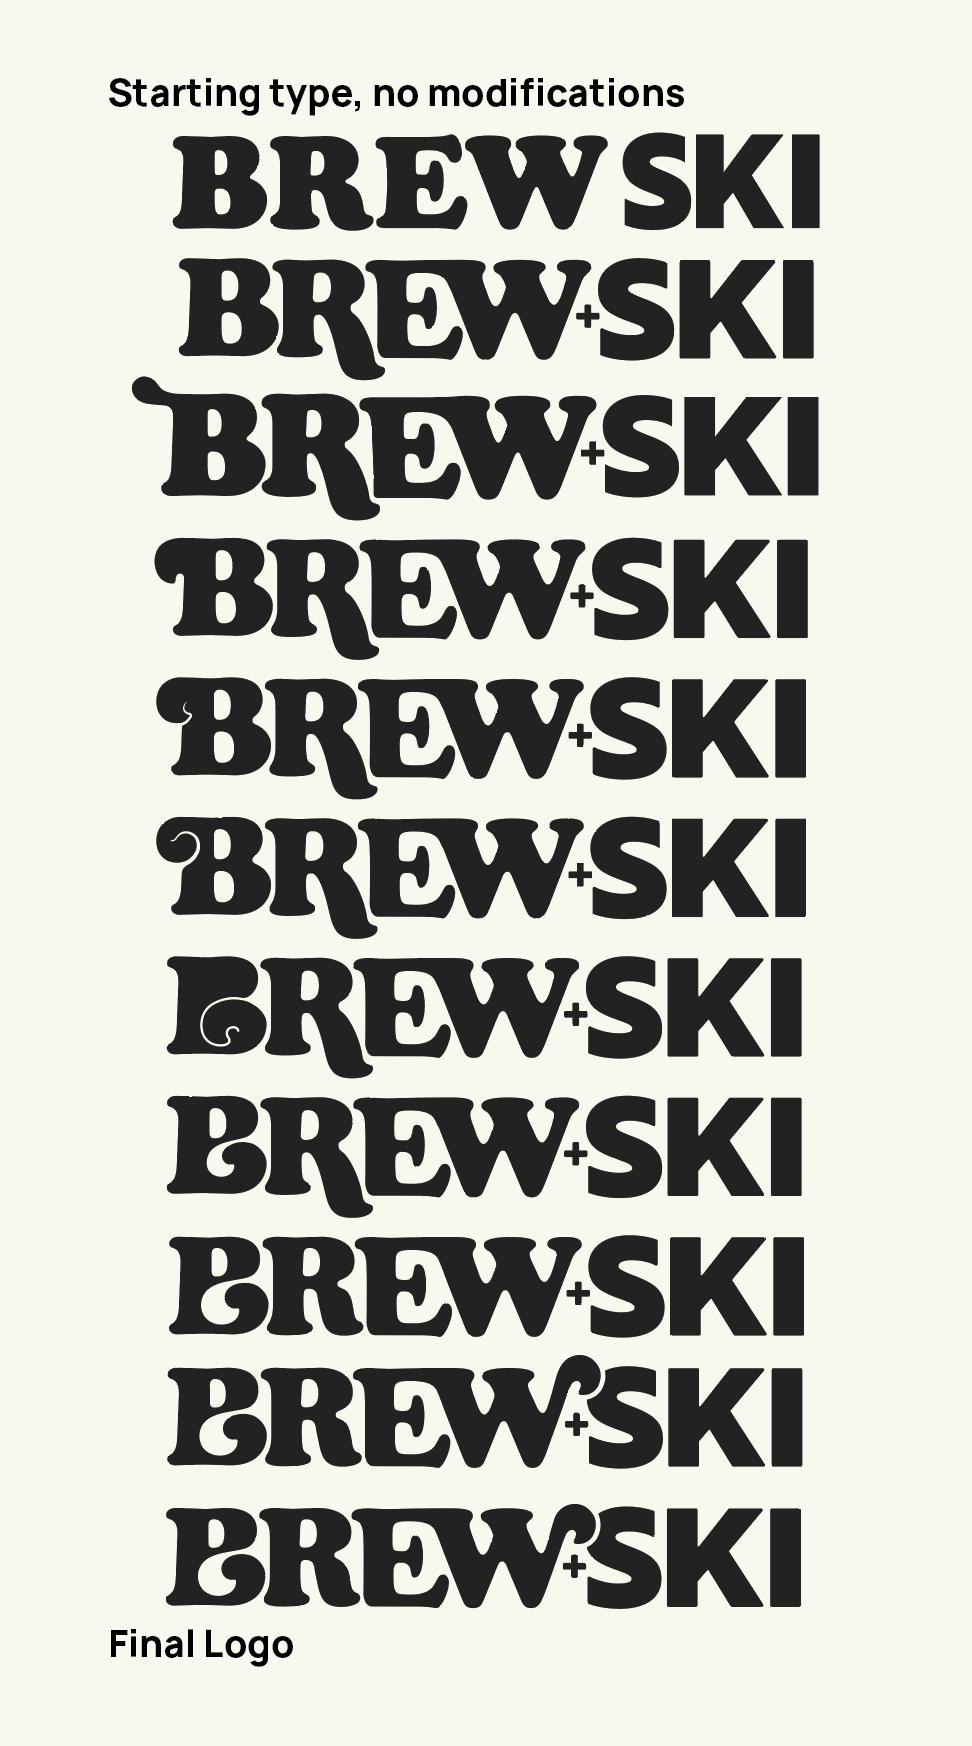 Image of logo process for BREWSKI